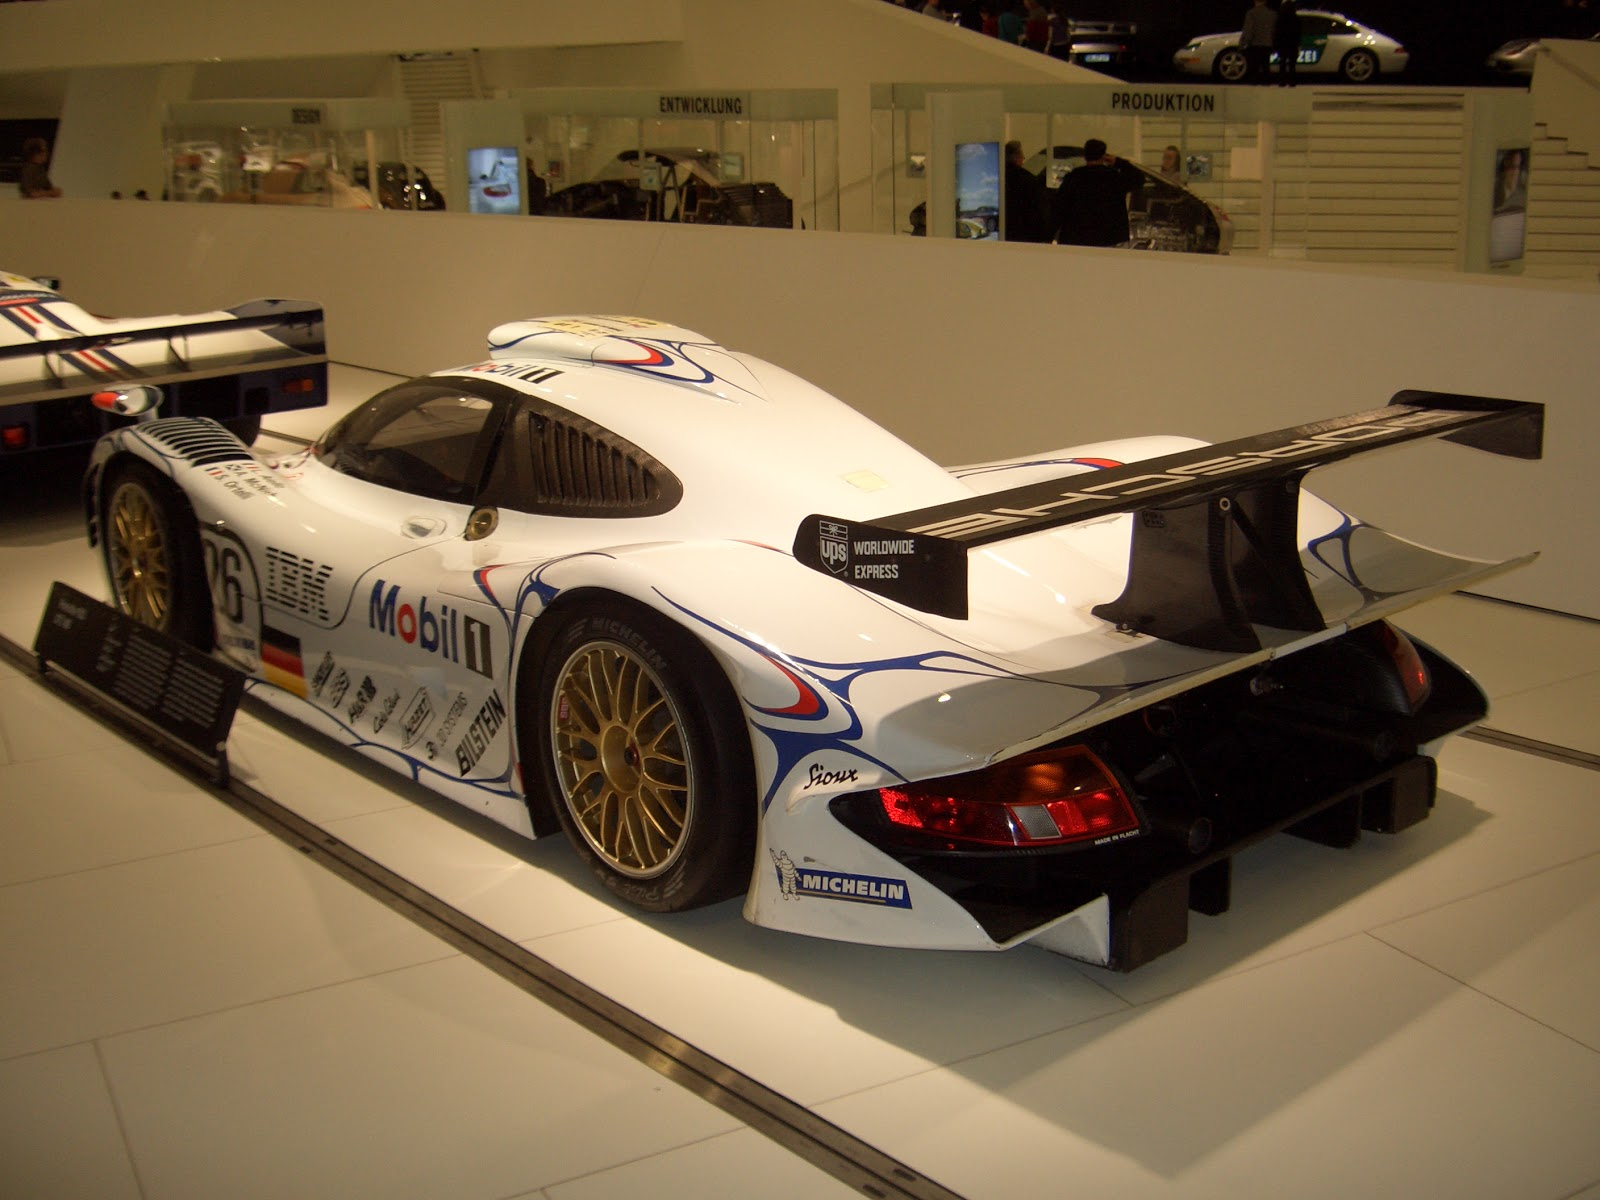 porsche-911-gt1-coupe-1998-backleft-2009 Wonderful 1998 Porsche 911 Gt1 Specs Cars Trend